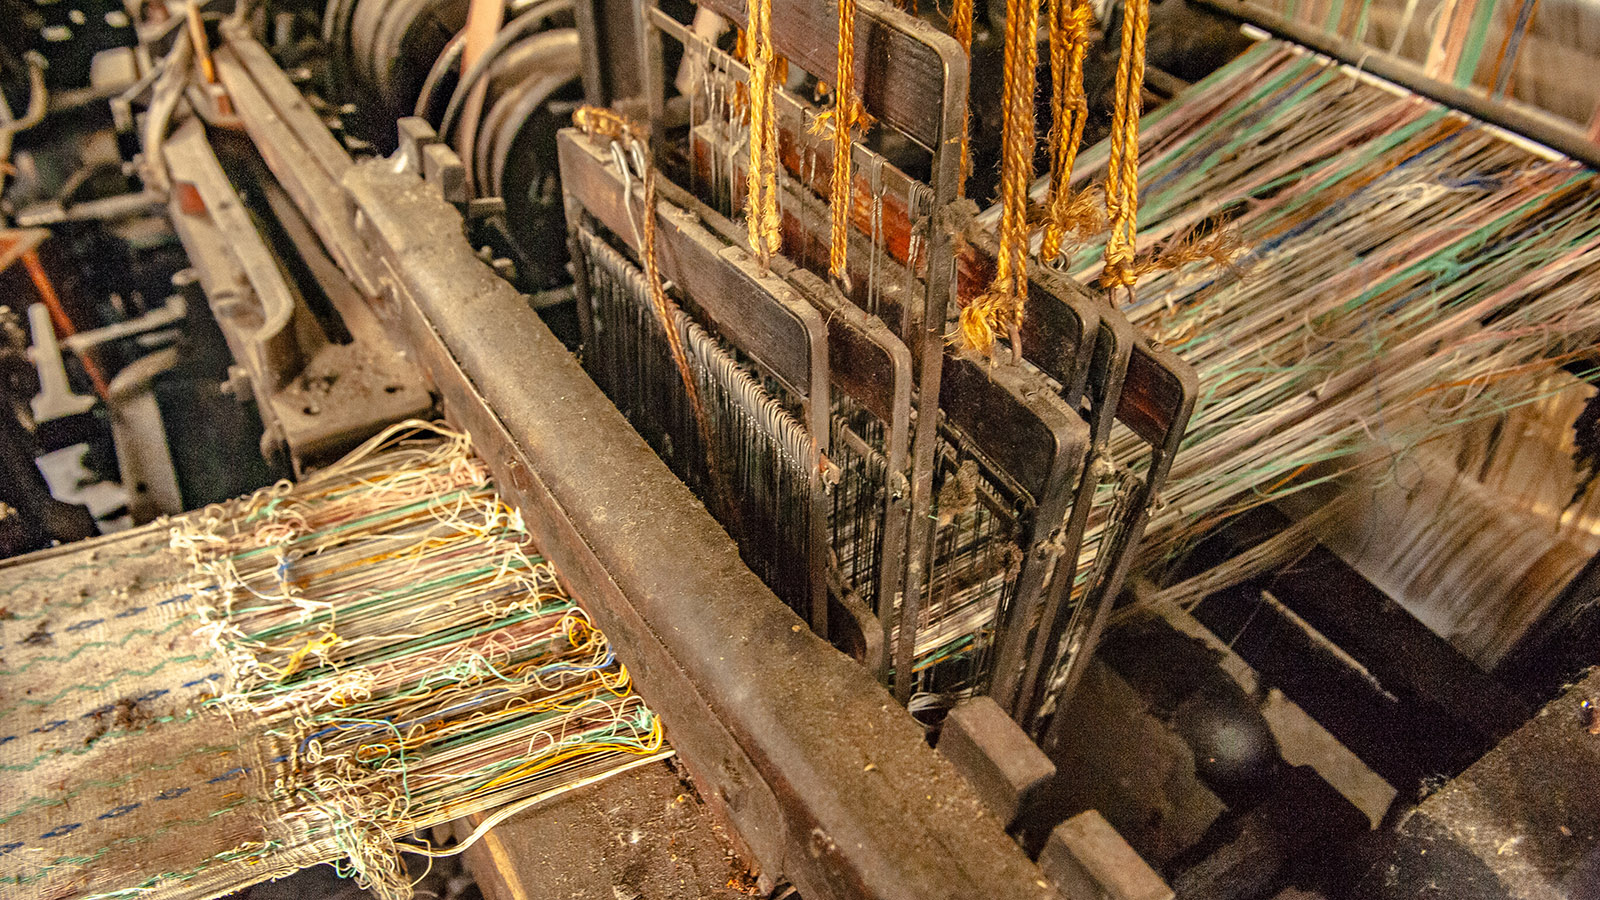 Arles-sur-Tech, Le Moulin: Detail eines Webstuhles. Foto: Hilke Maunder